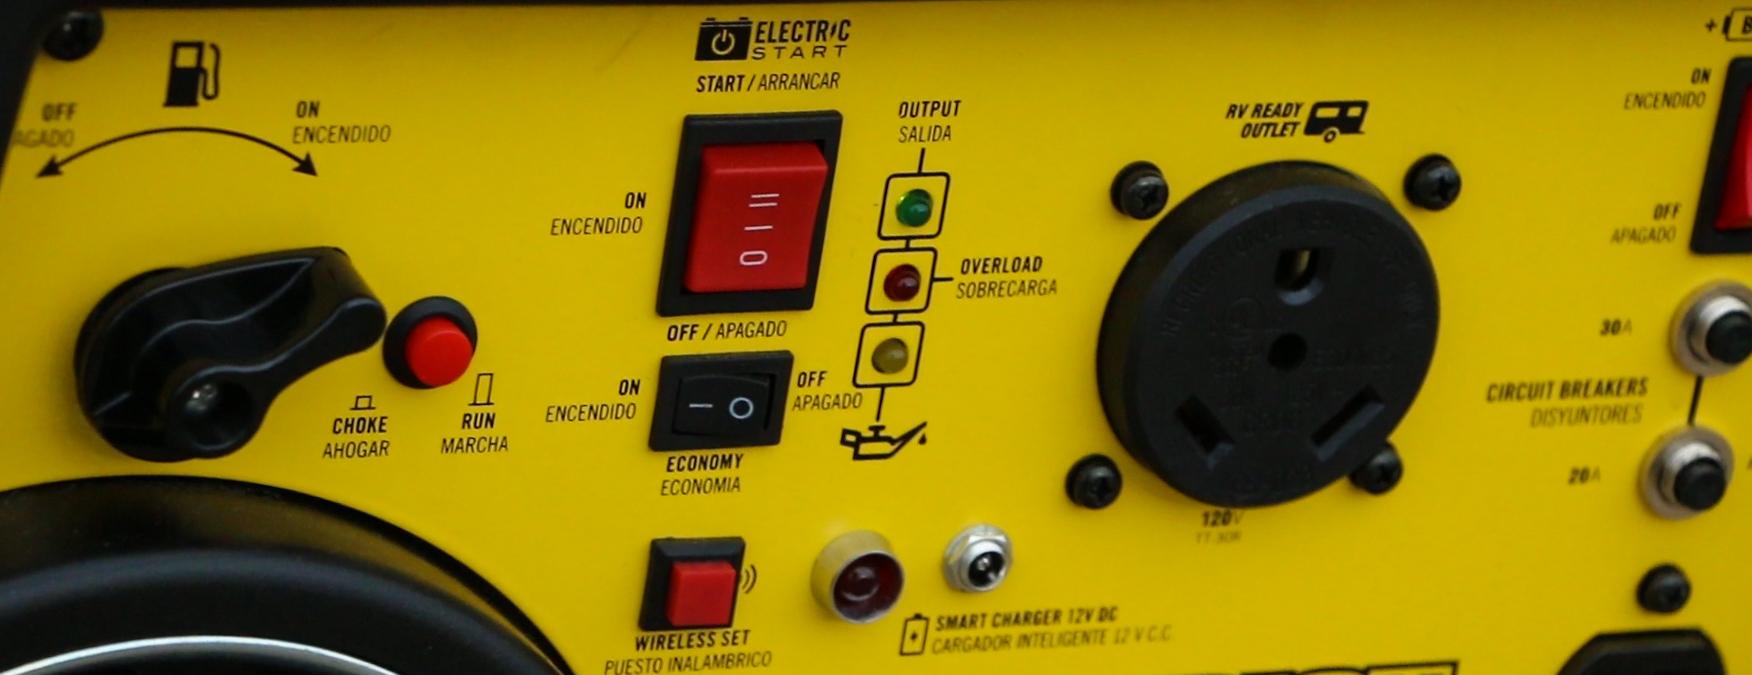 Champion Remote Start Inverter Generator | Busted Wallet